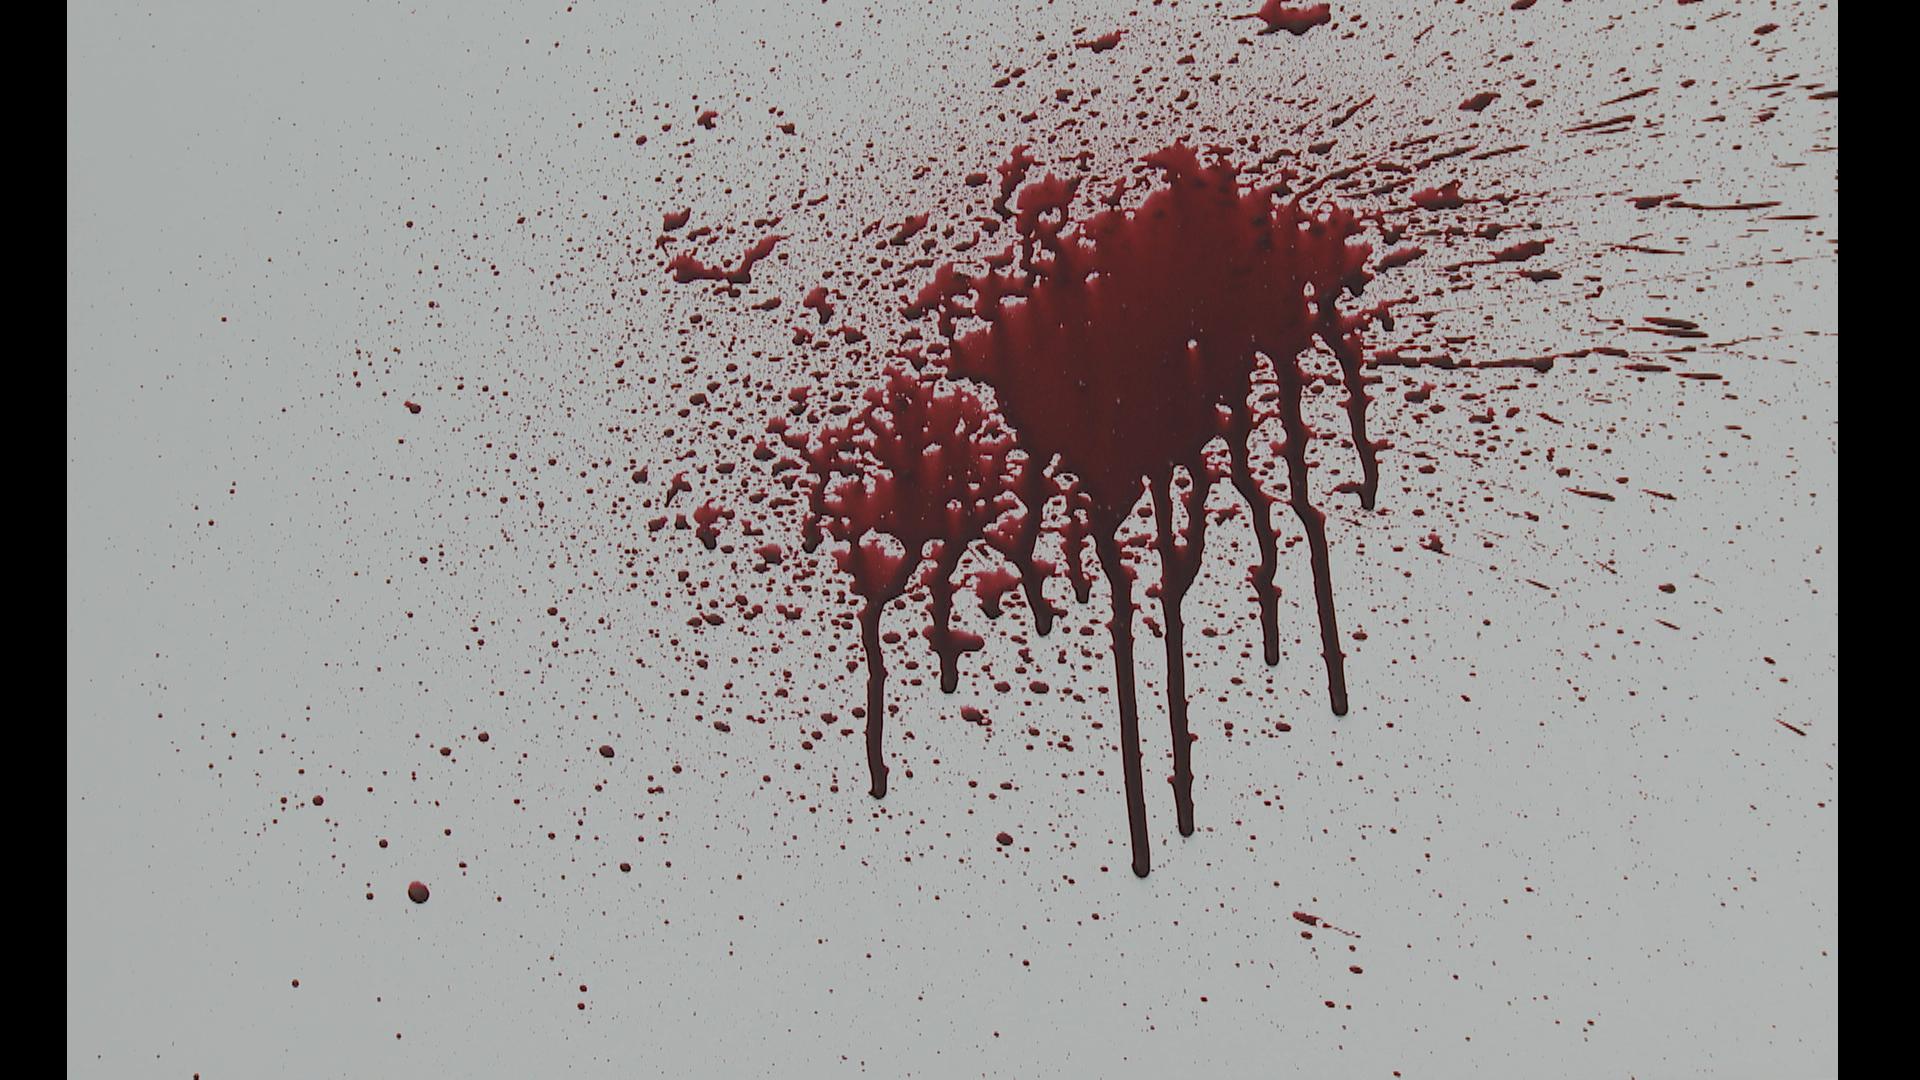 Download Blood PNG Image.